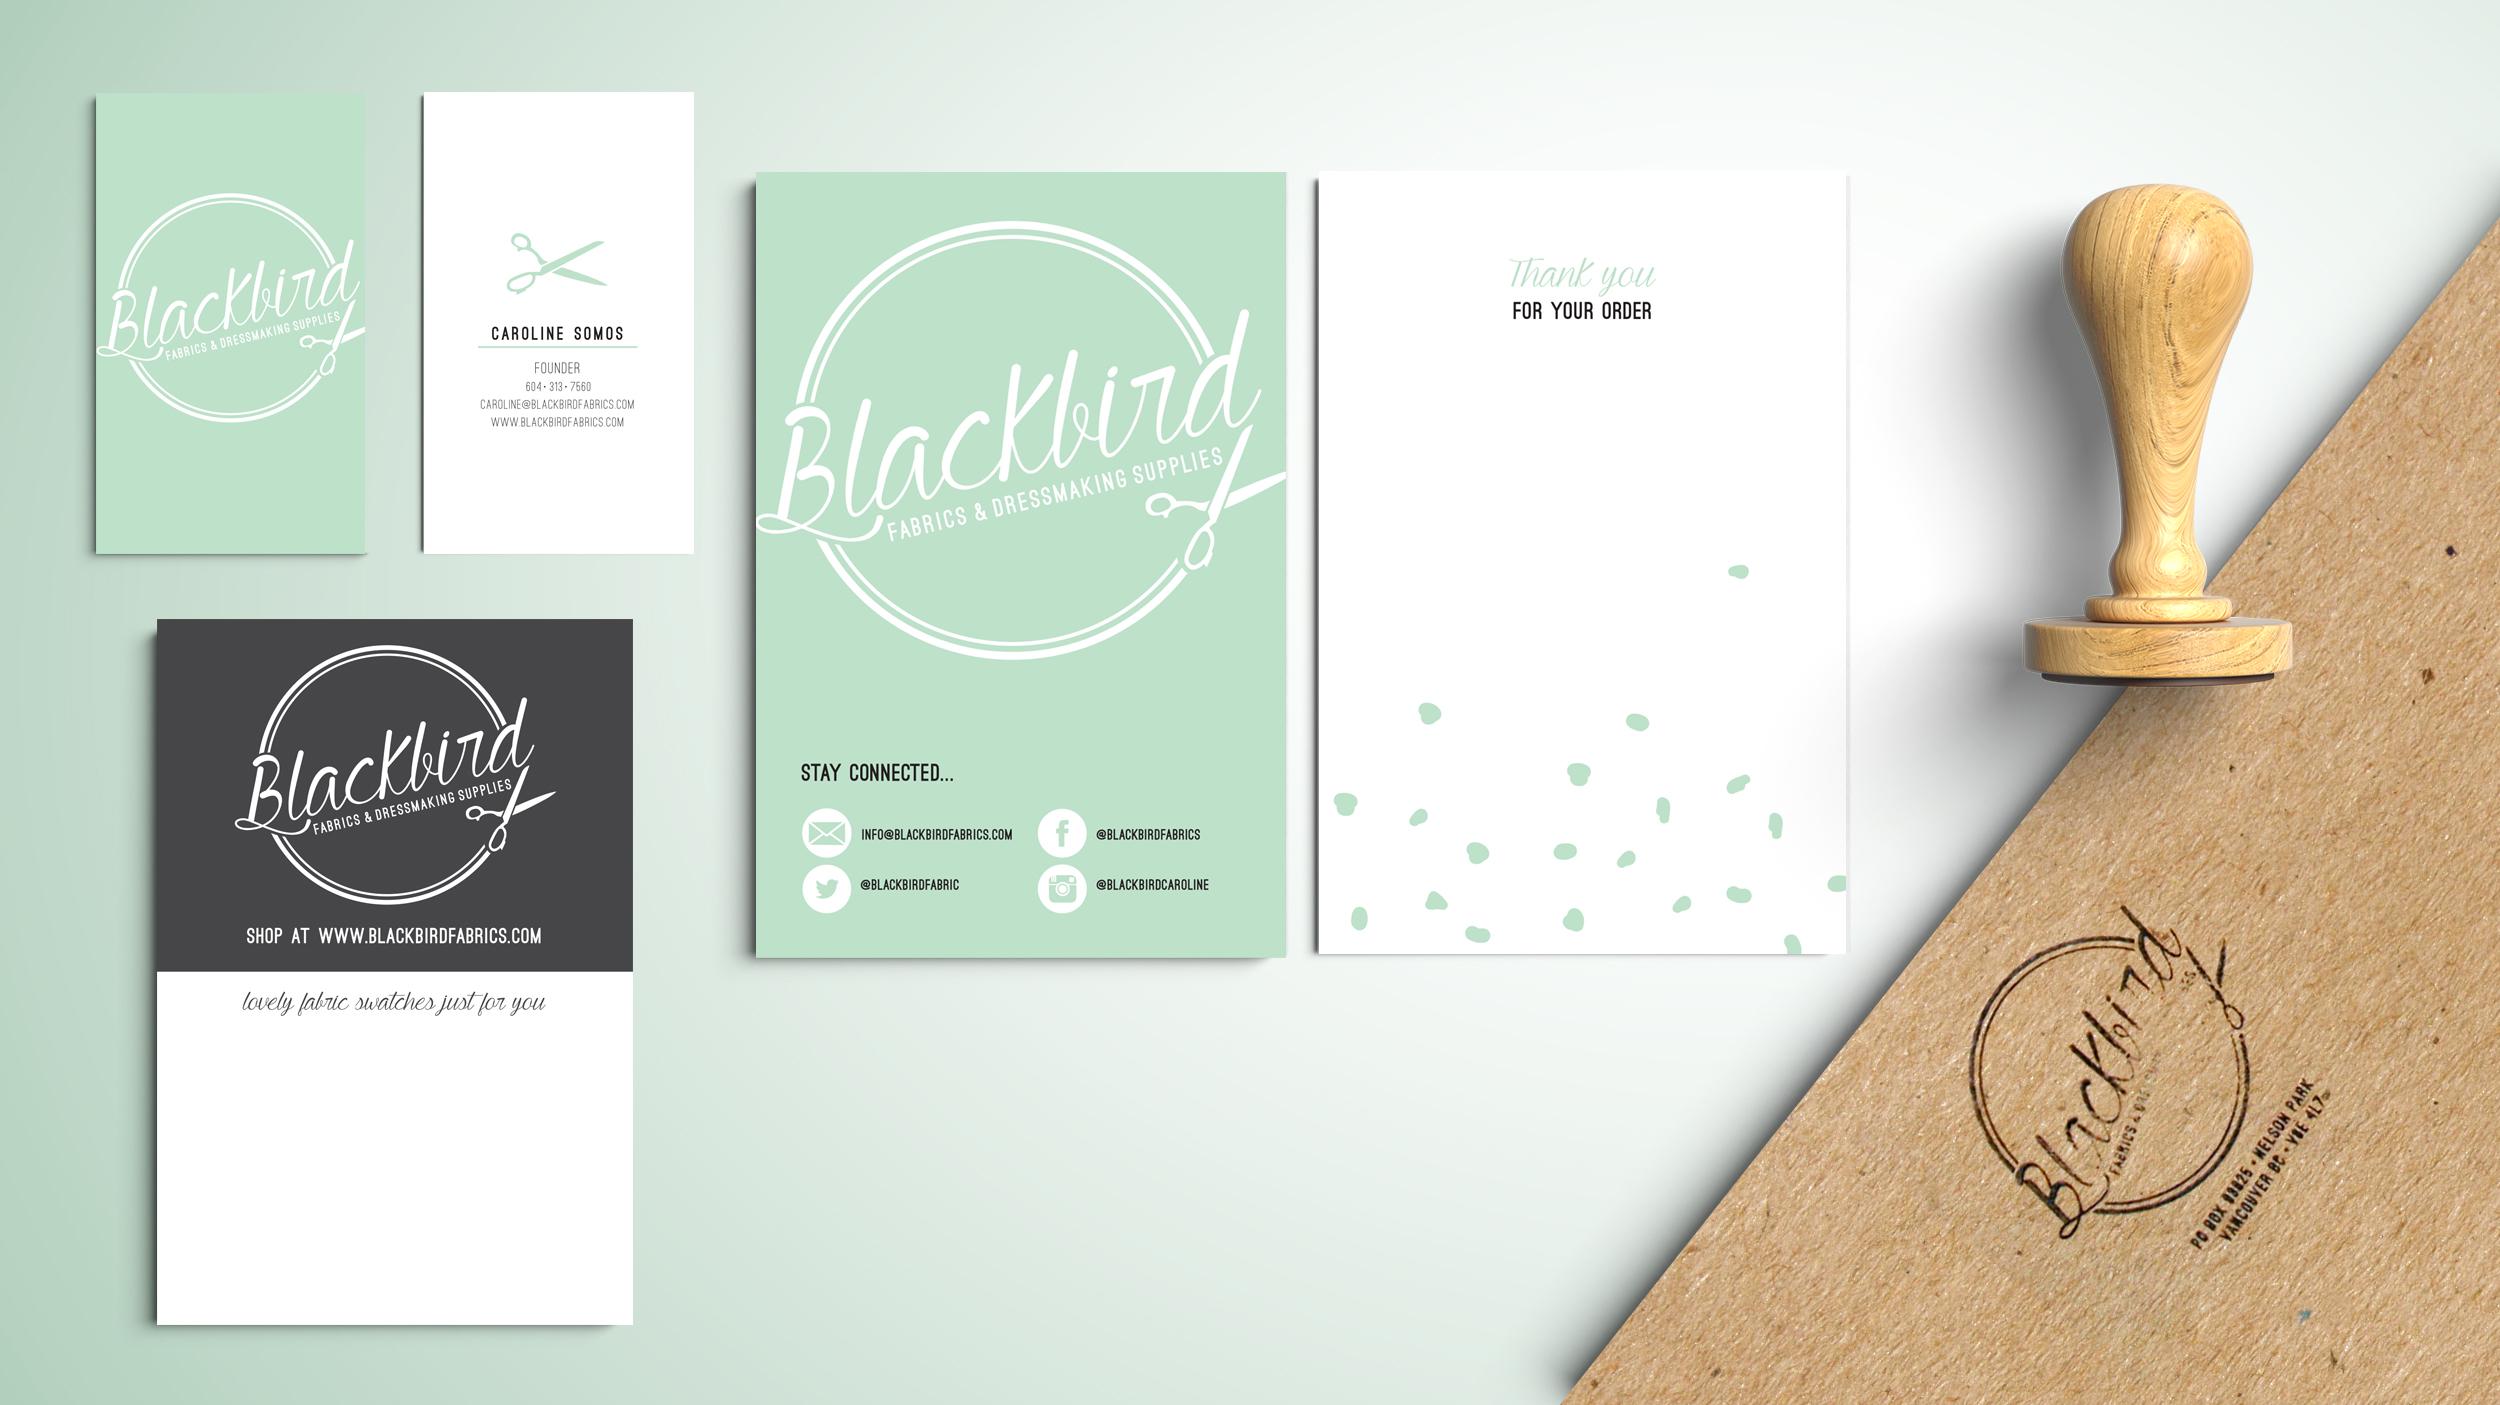 katelynbishop_design_blackbird_brandingsuite